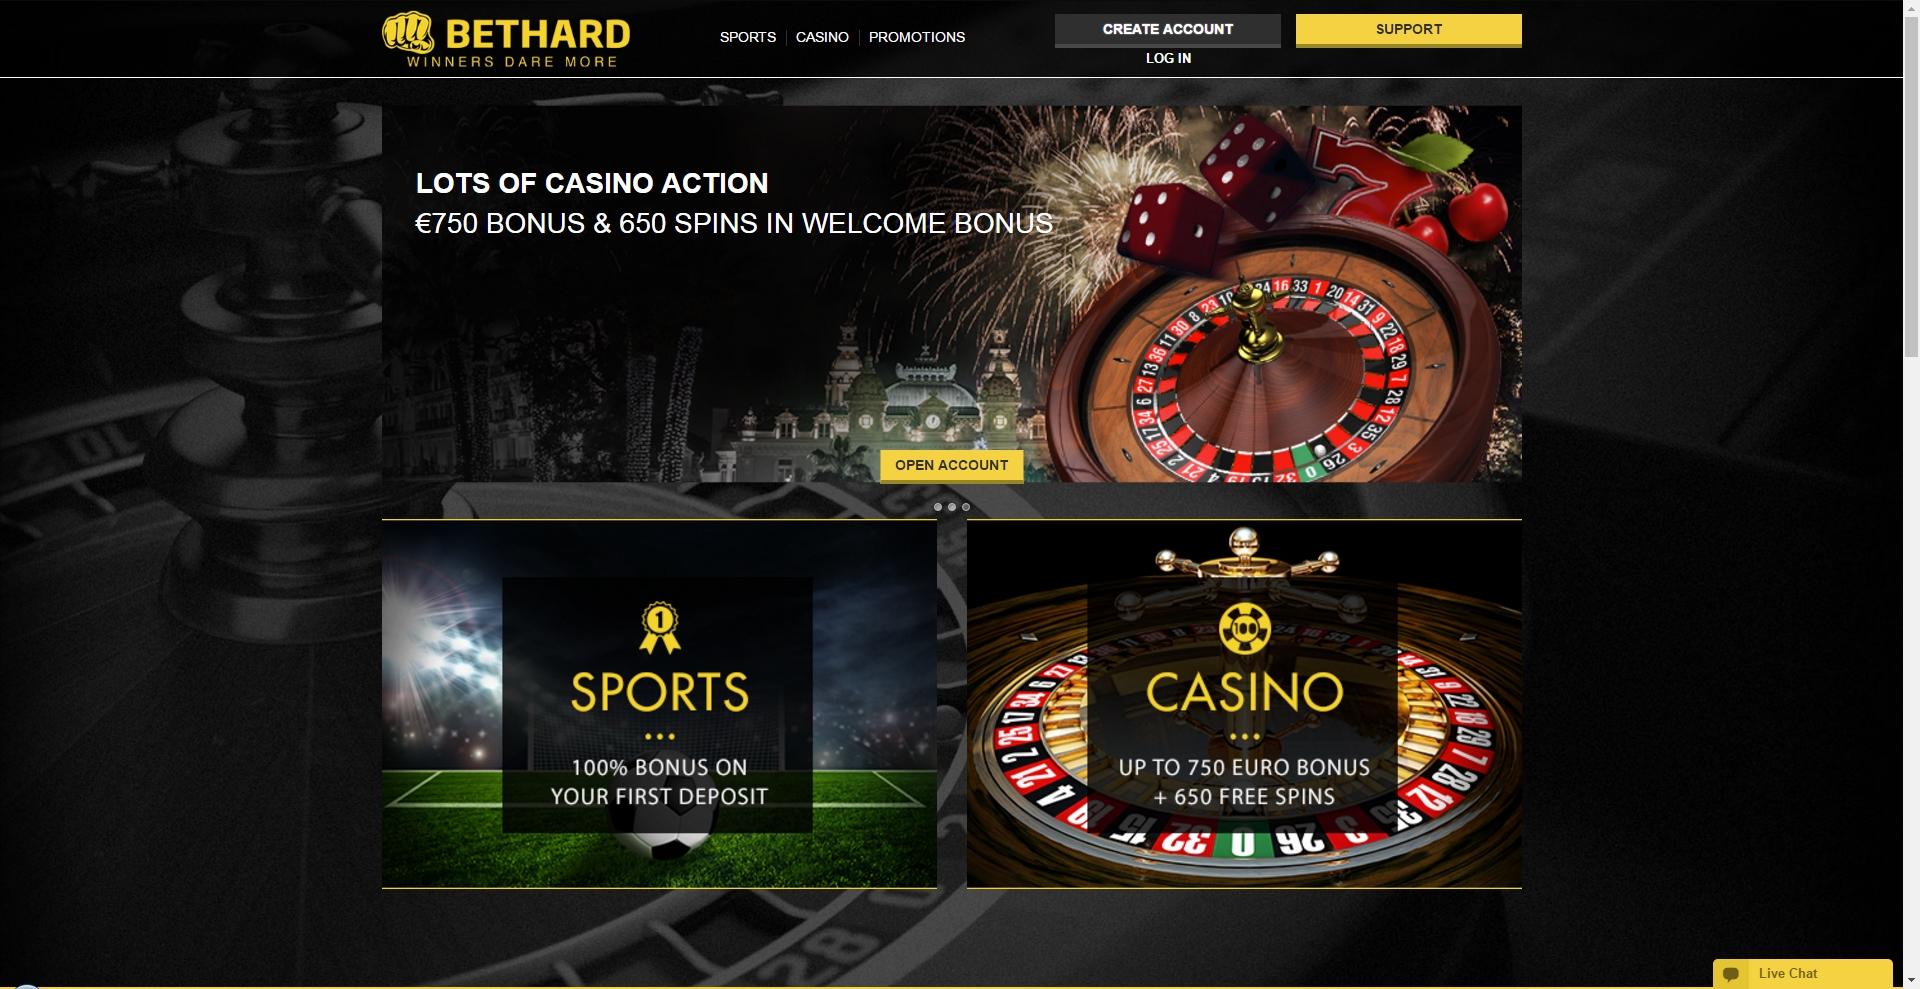 € Puce de casino gratuite 305 sur Gamebookers